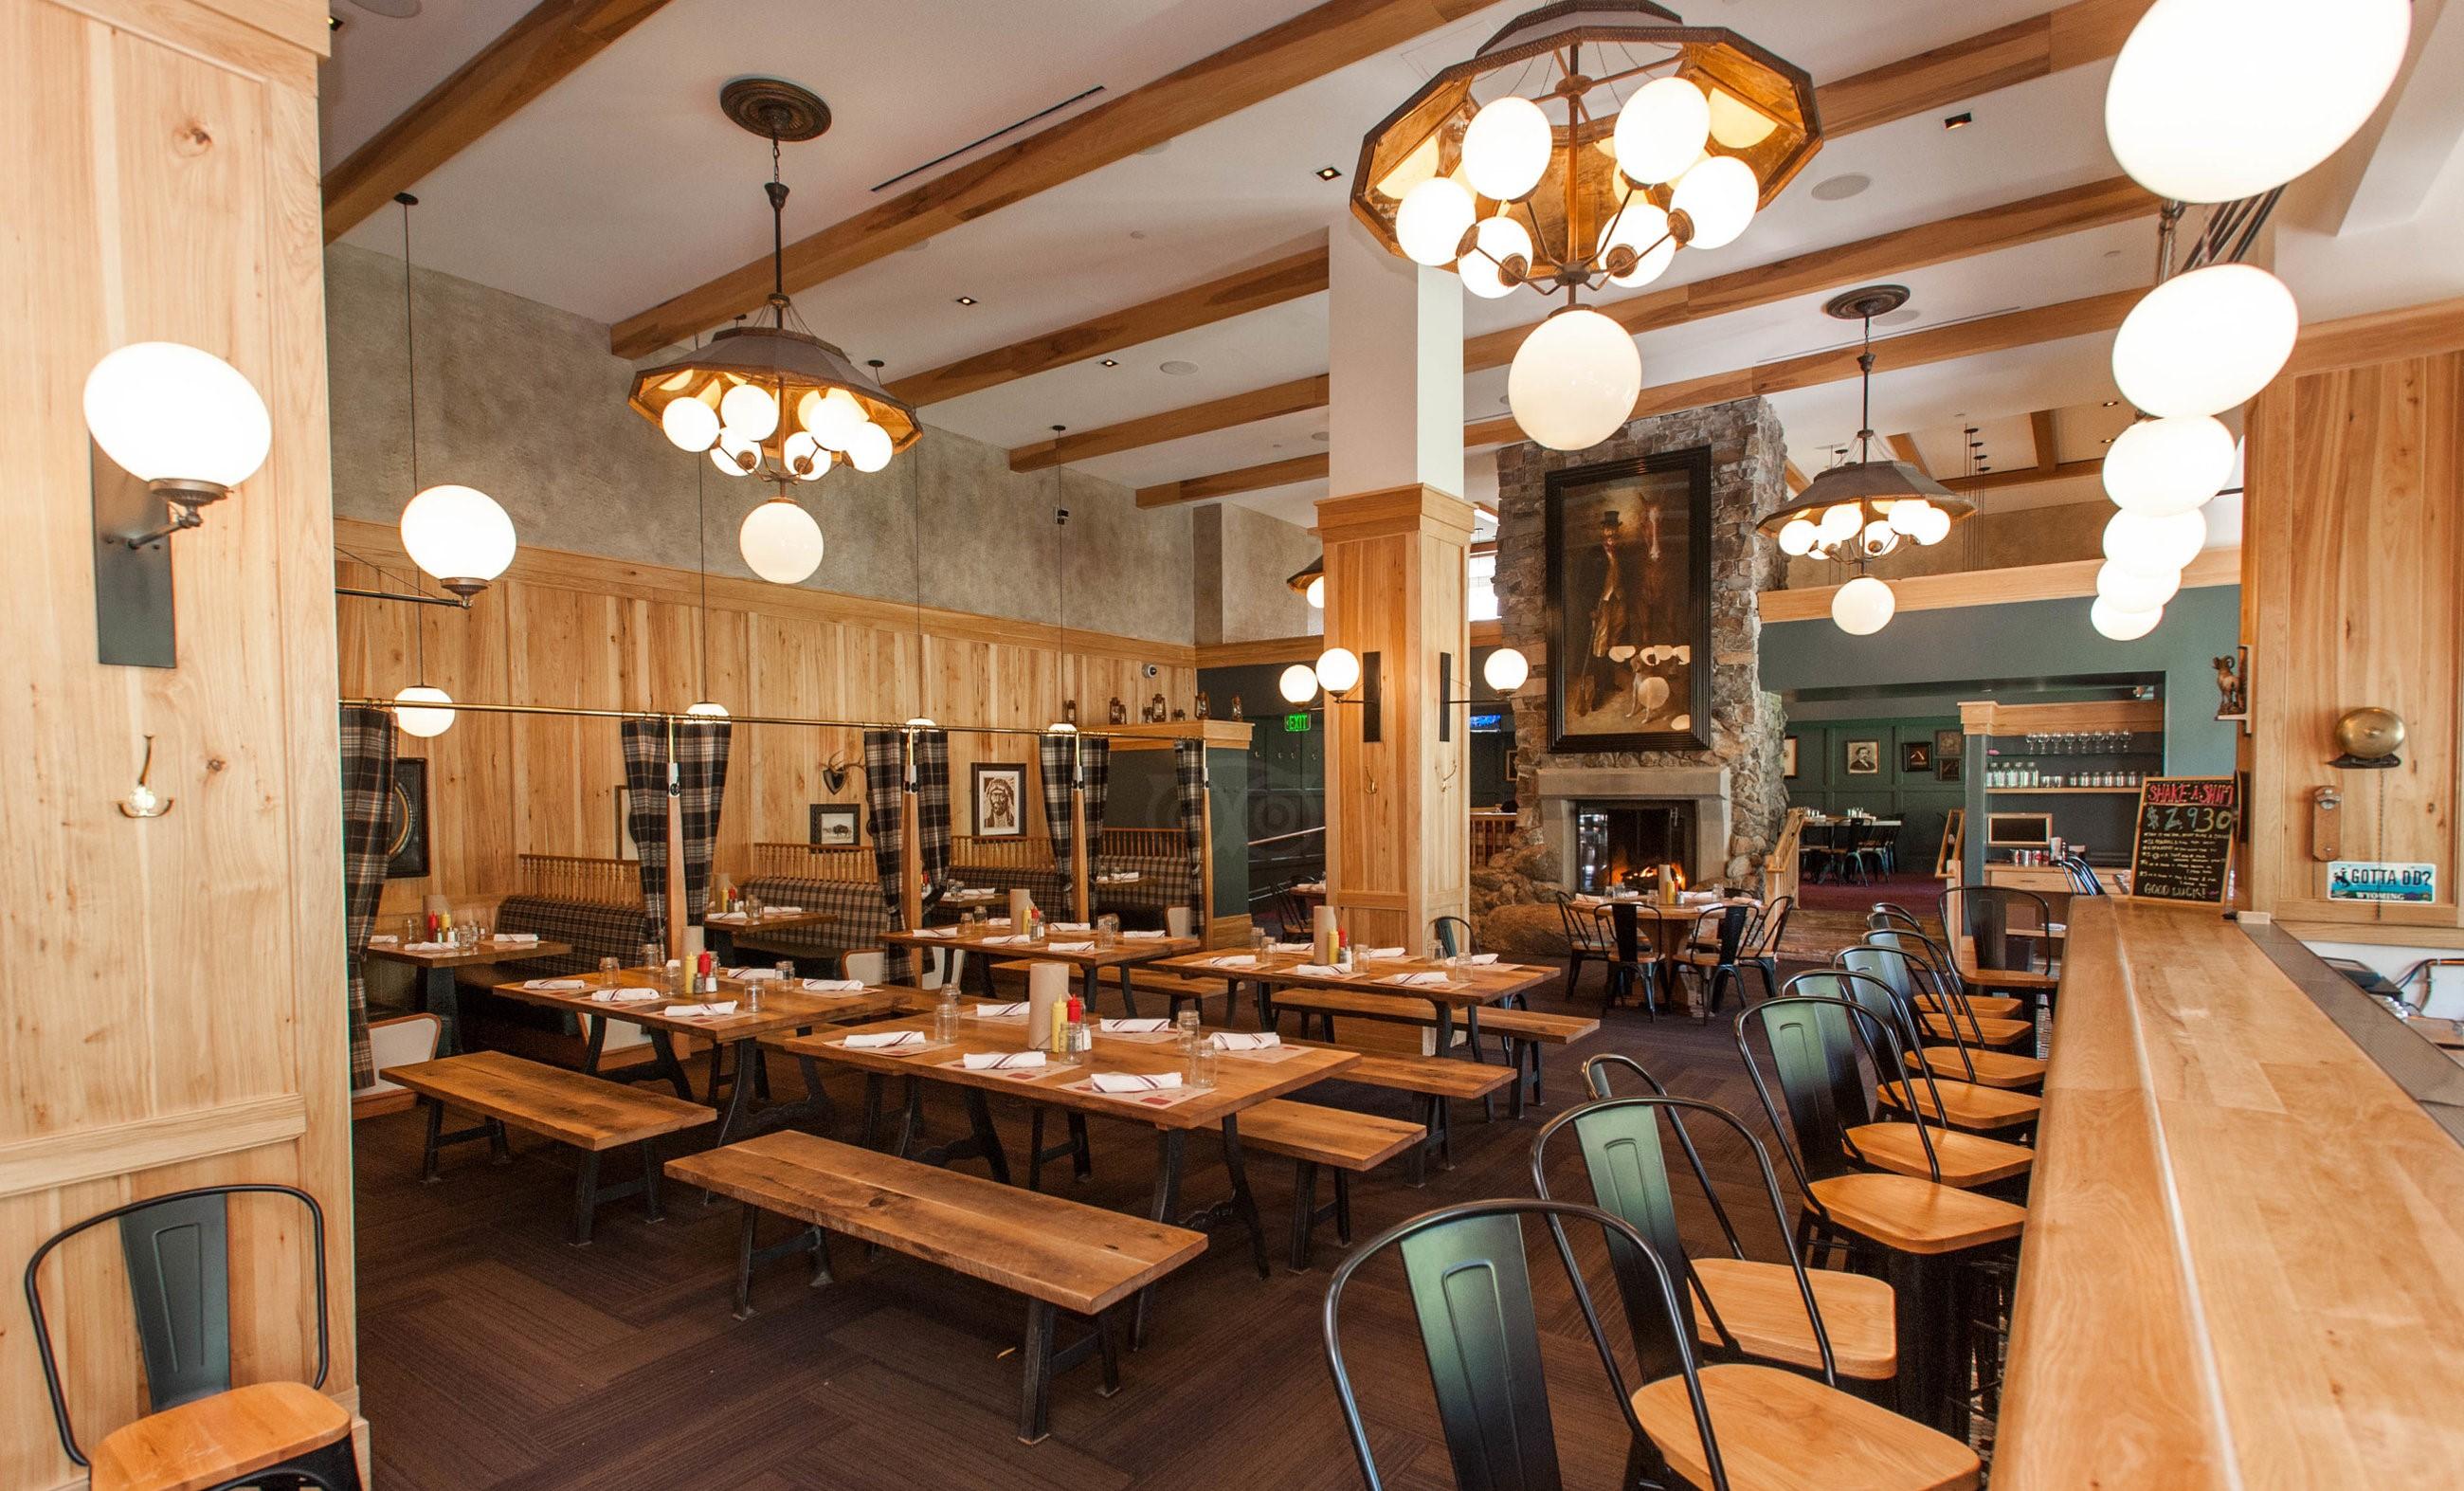 1919 market luxury apartments madison art for Four seasons jackson hole restaurant